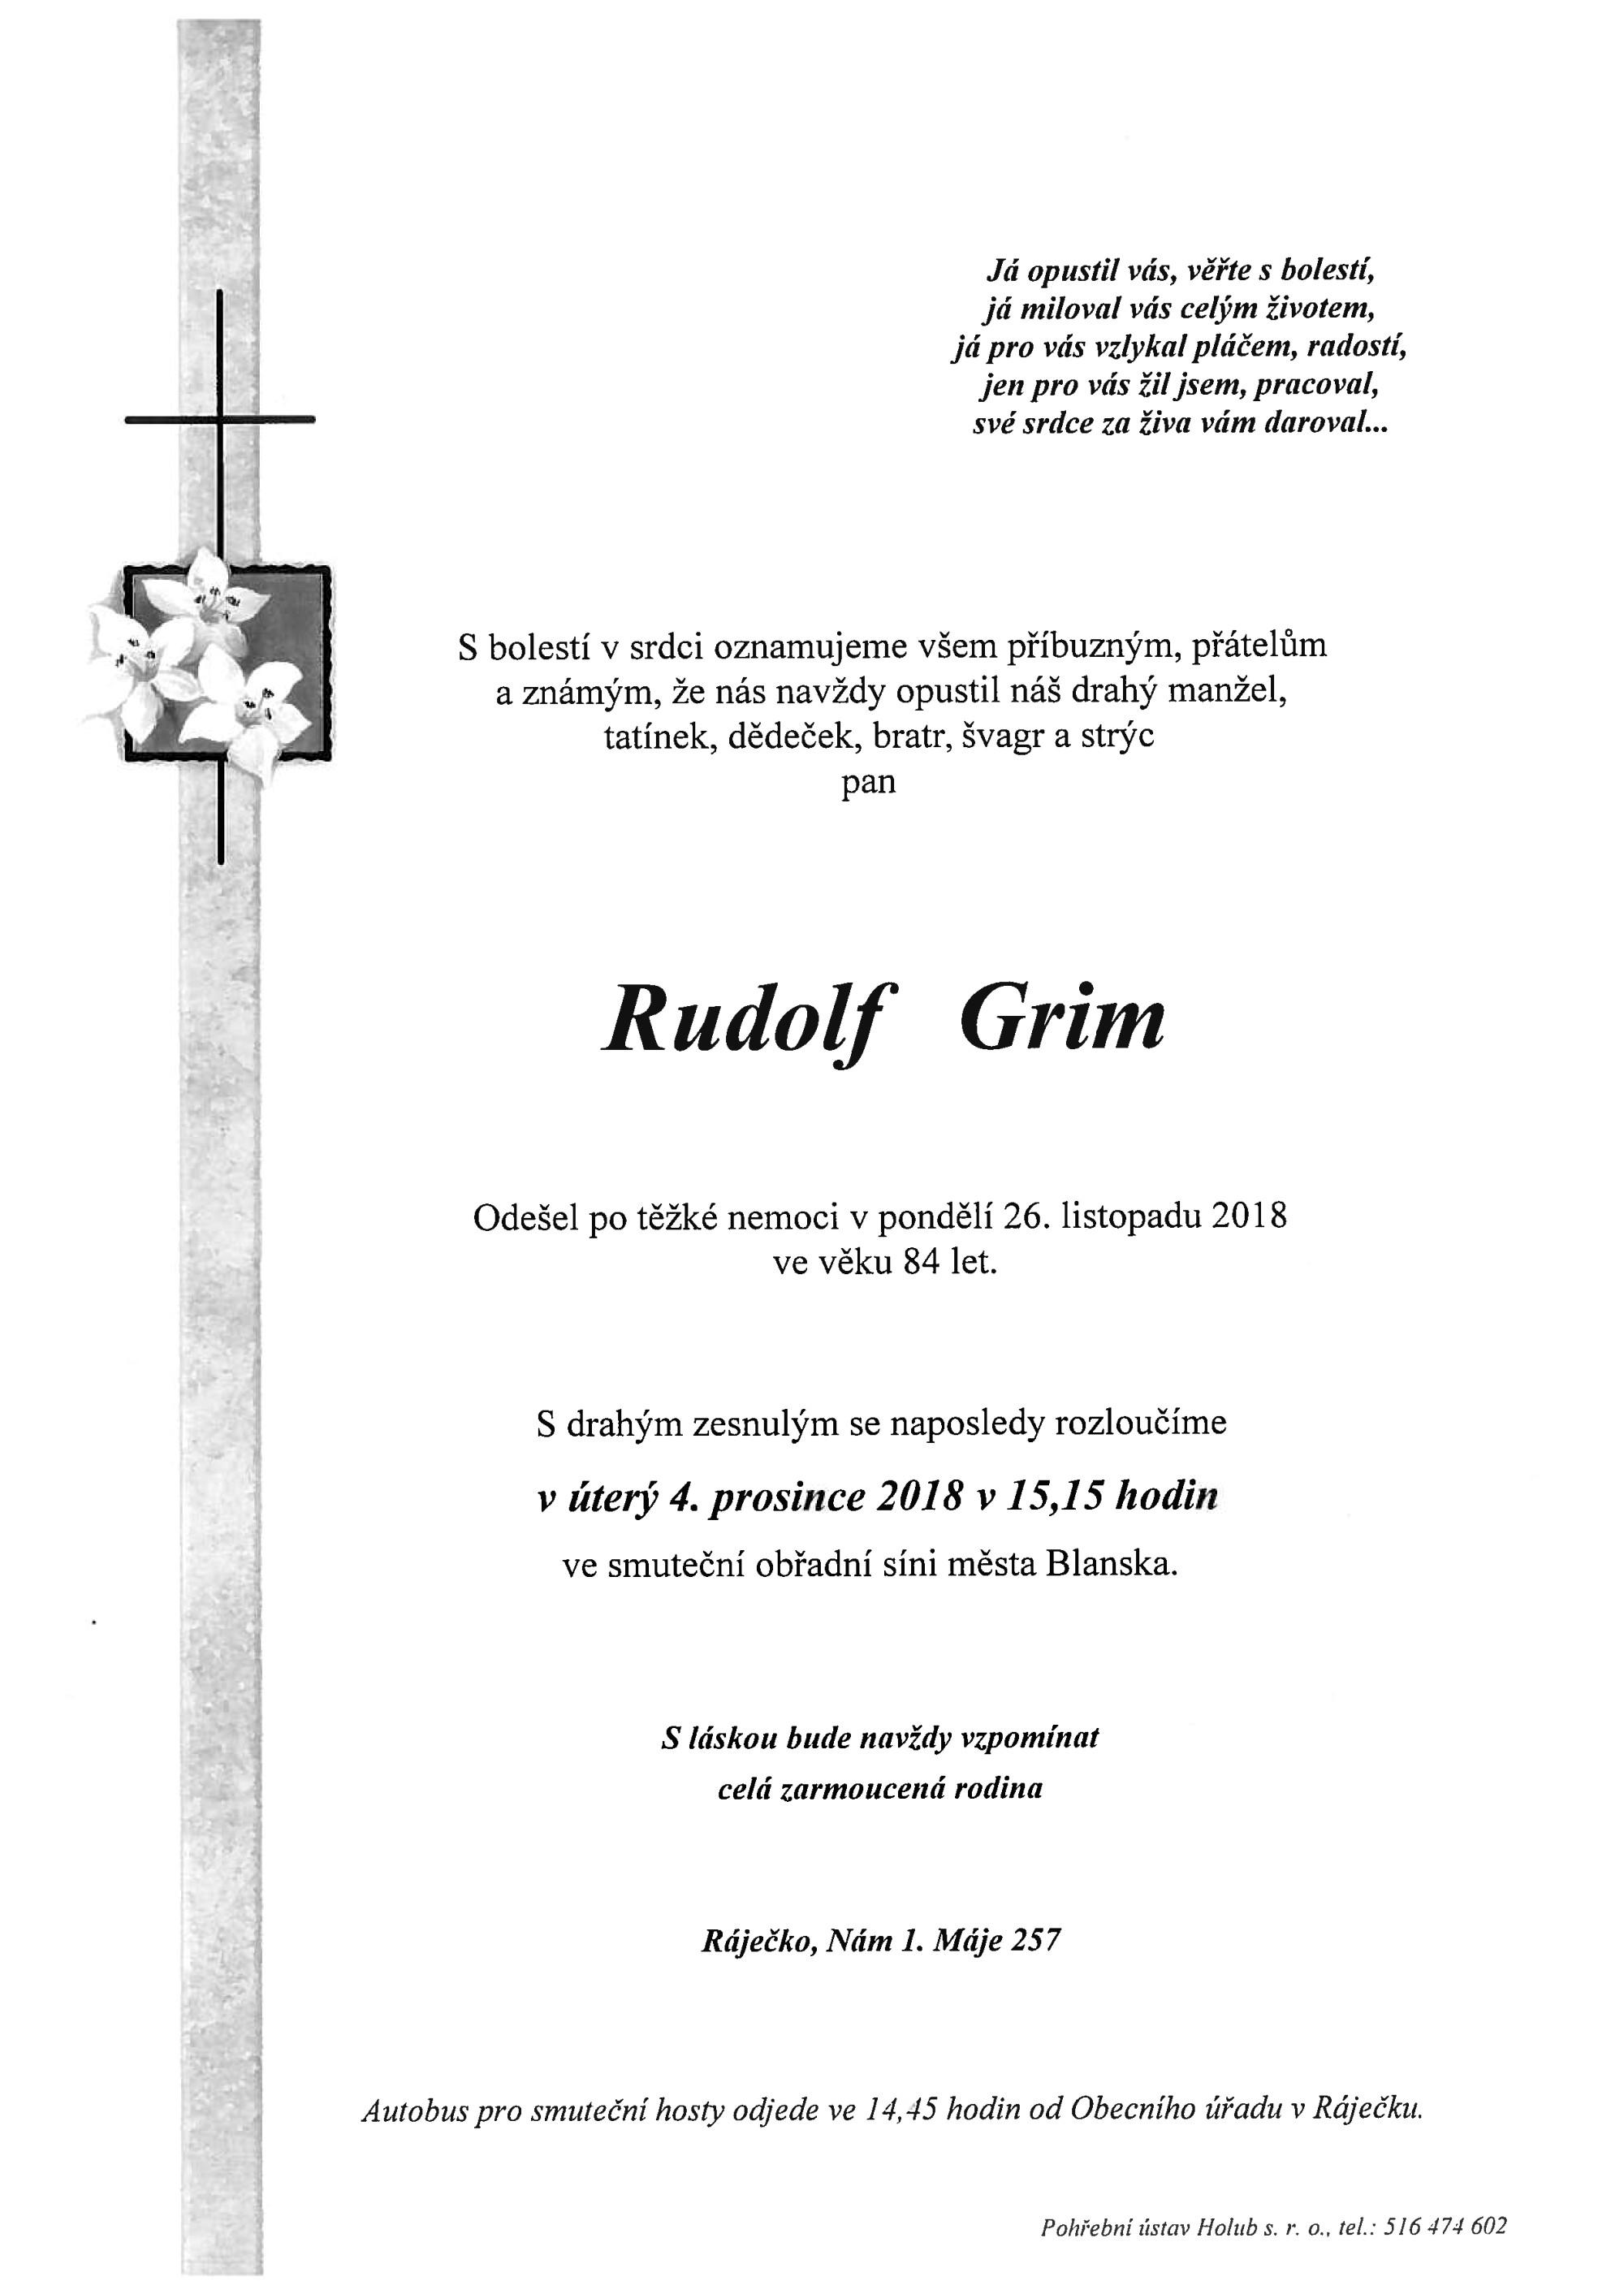 Rudolf Grim